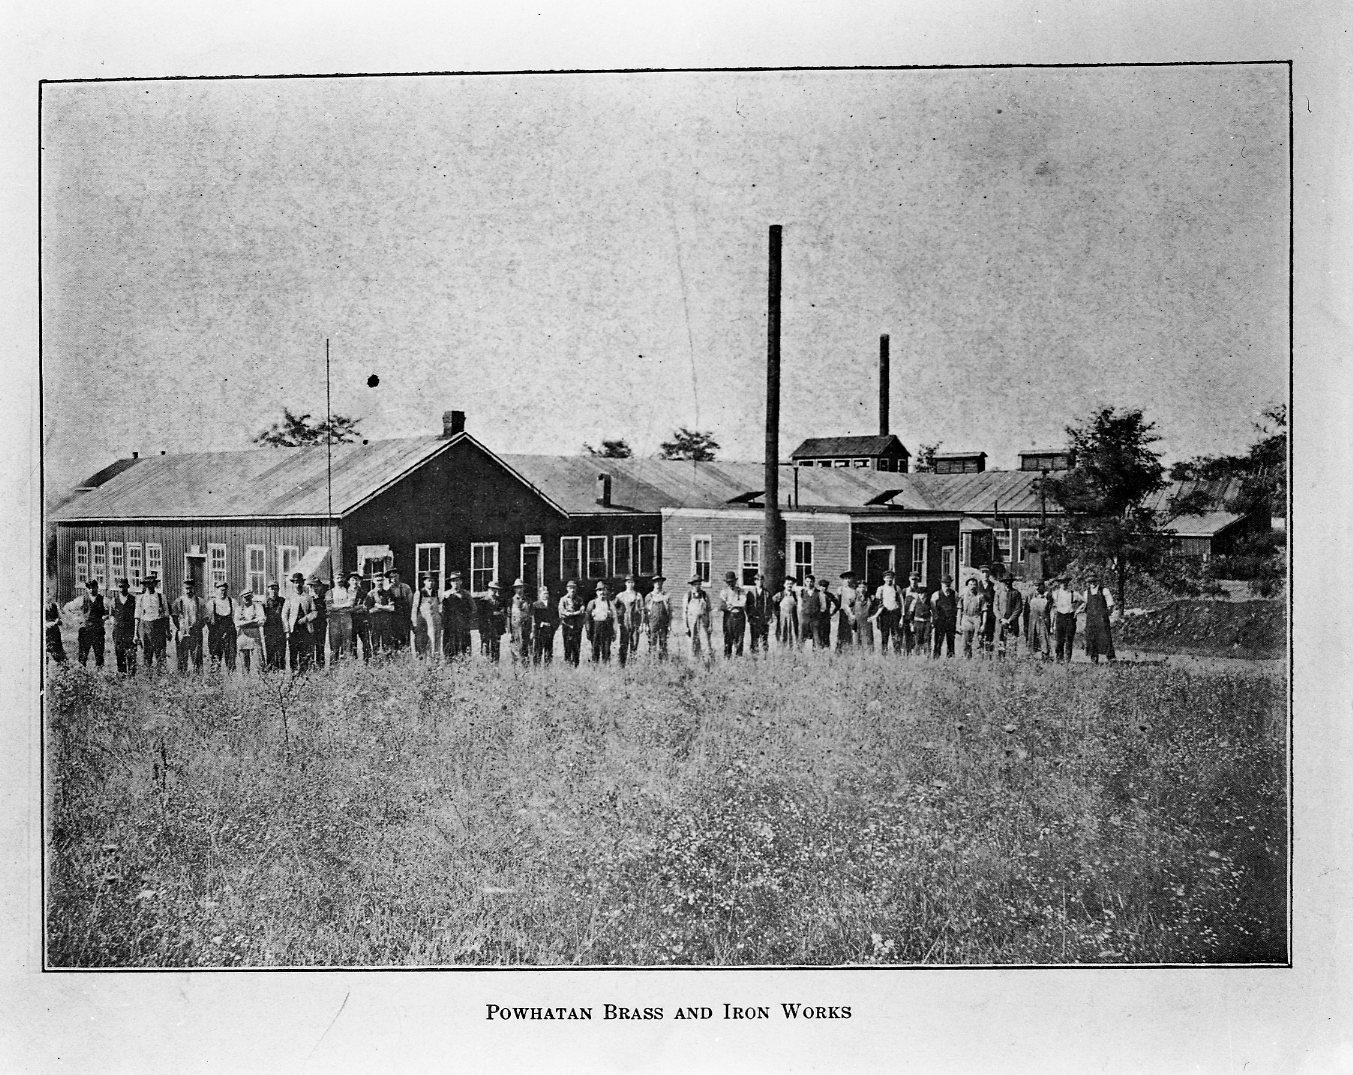 Powhatan Brass & Iron Works, undated